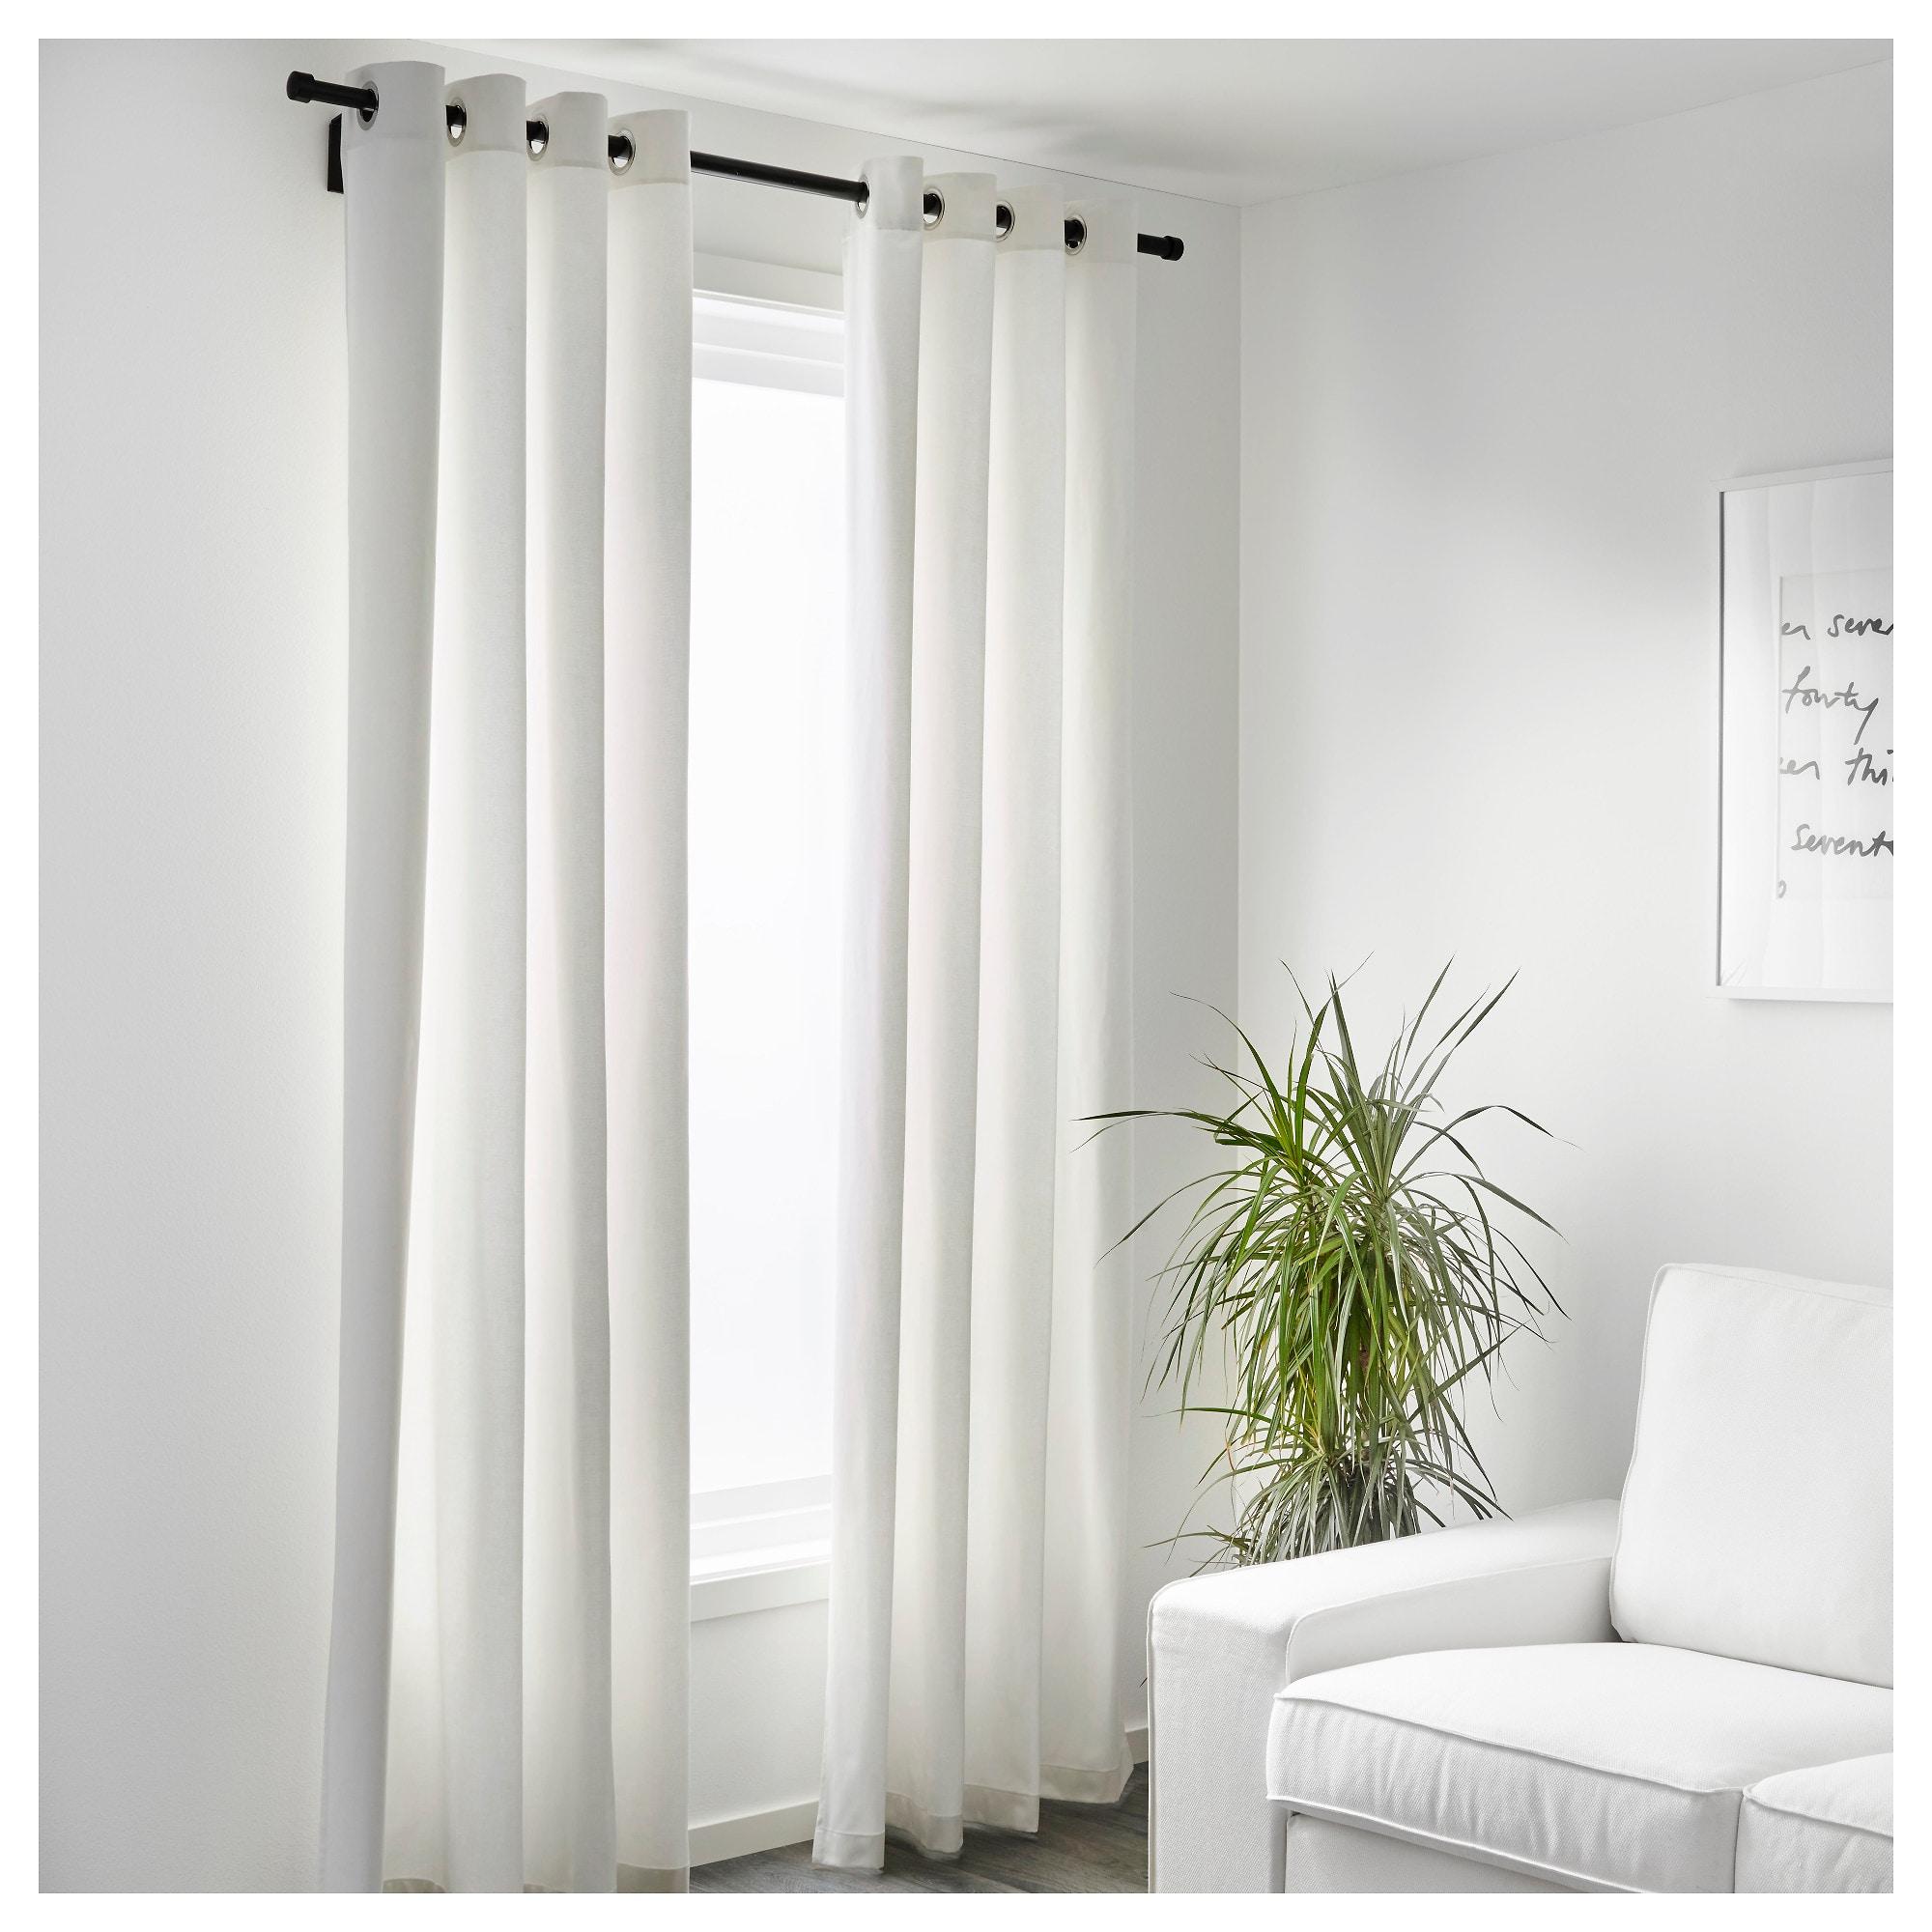 1 Pair Ikea Eyelet Curtains Bedroom